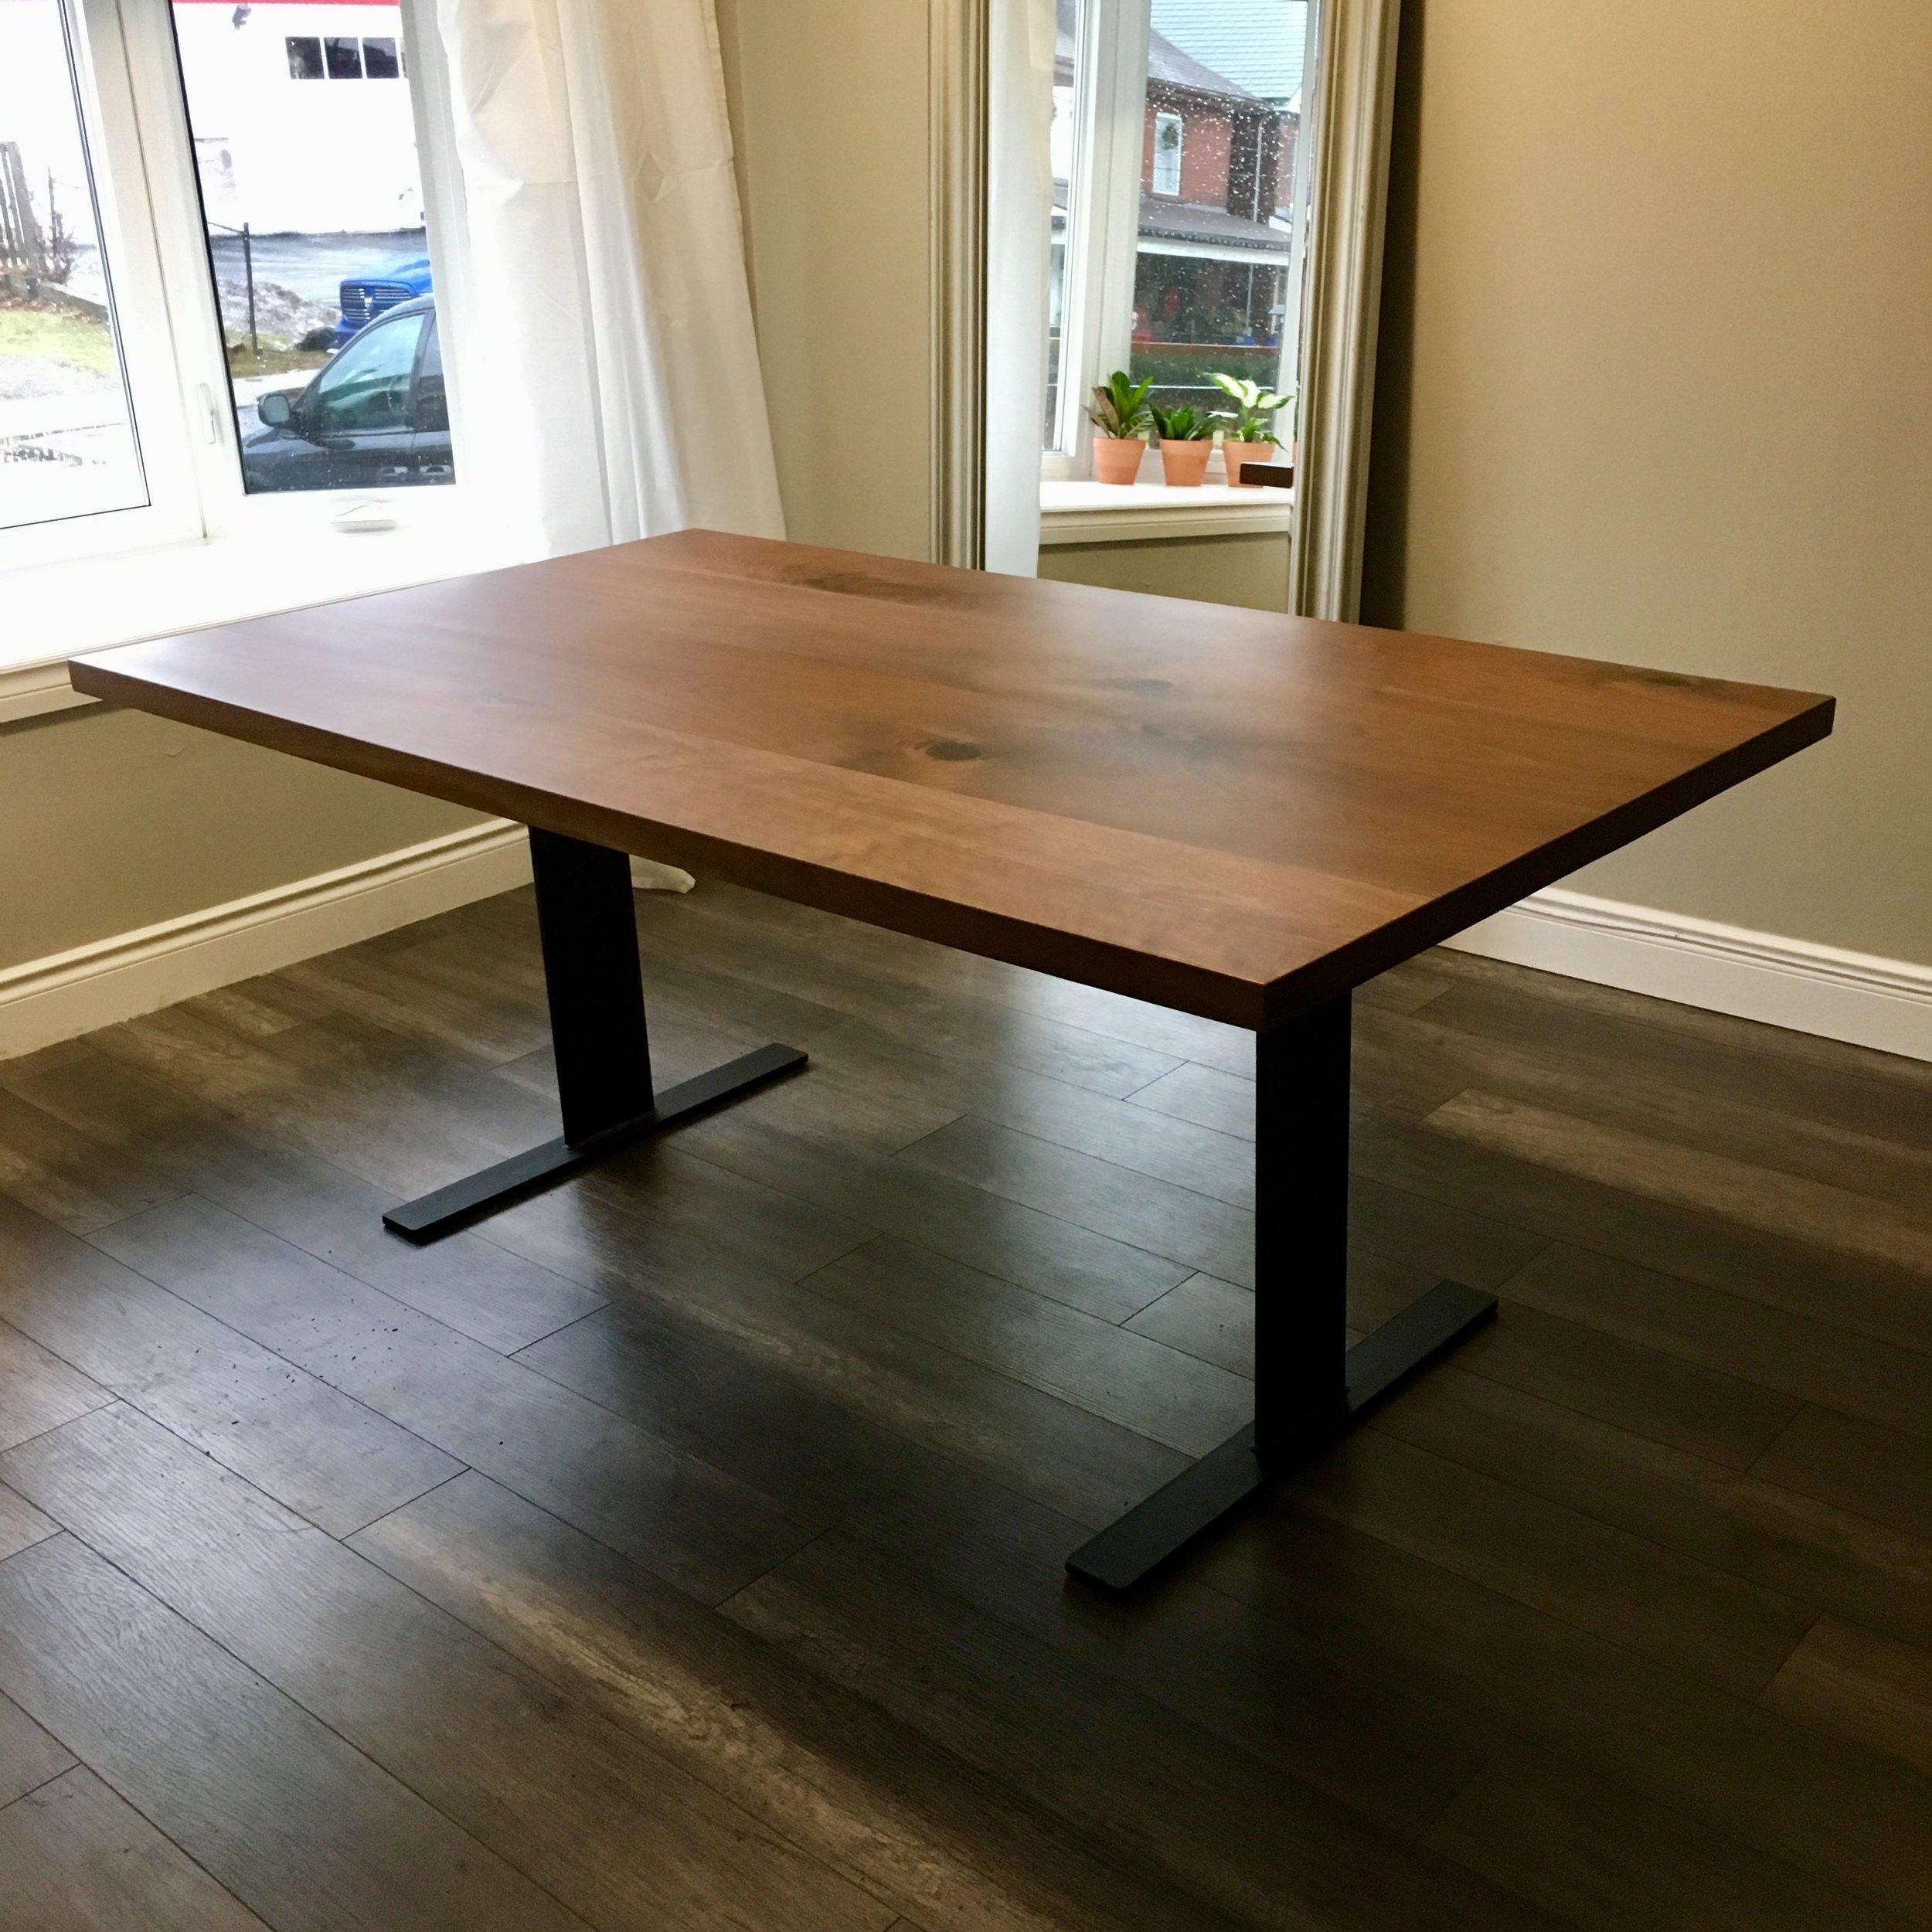 Straight edge walnut top with flat pedestal base